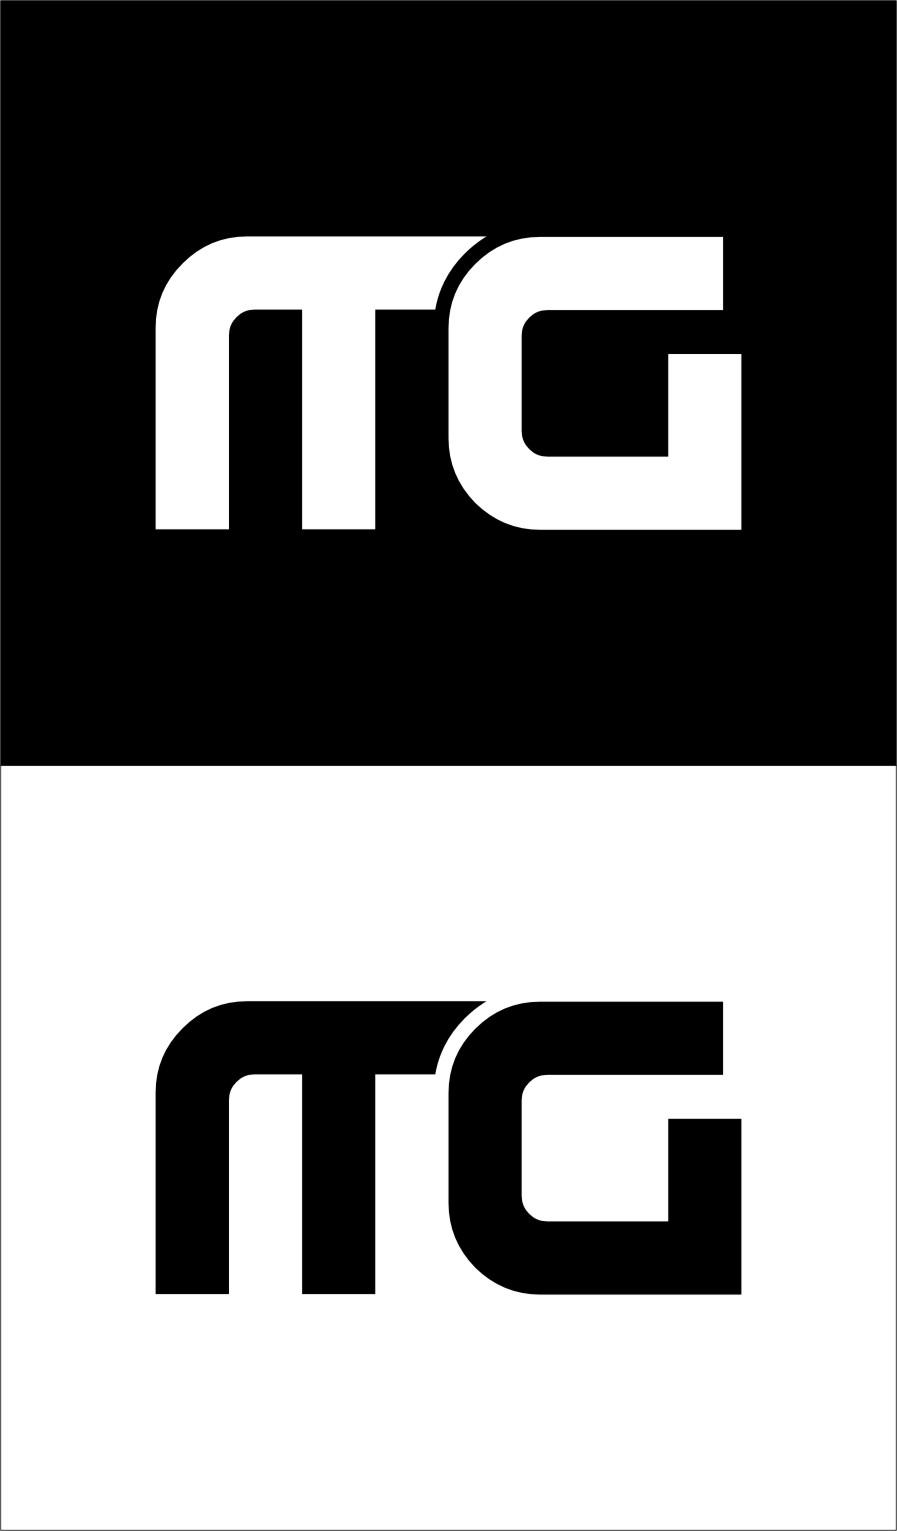 Custom Design by RasYa Muhammad Athaya - Entry No. 87 in the Custom Design Contest Imaginative Custom Design for MG.